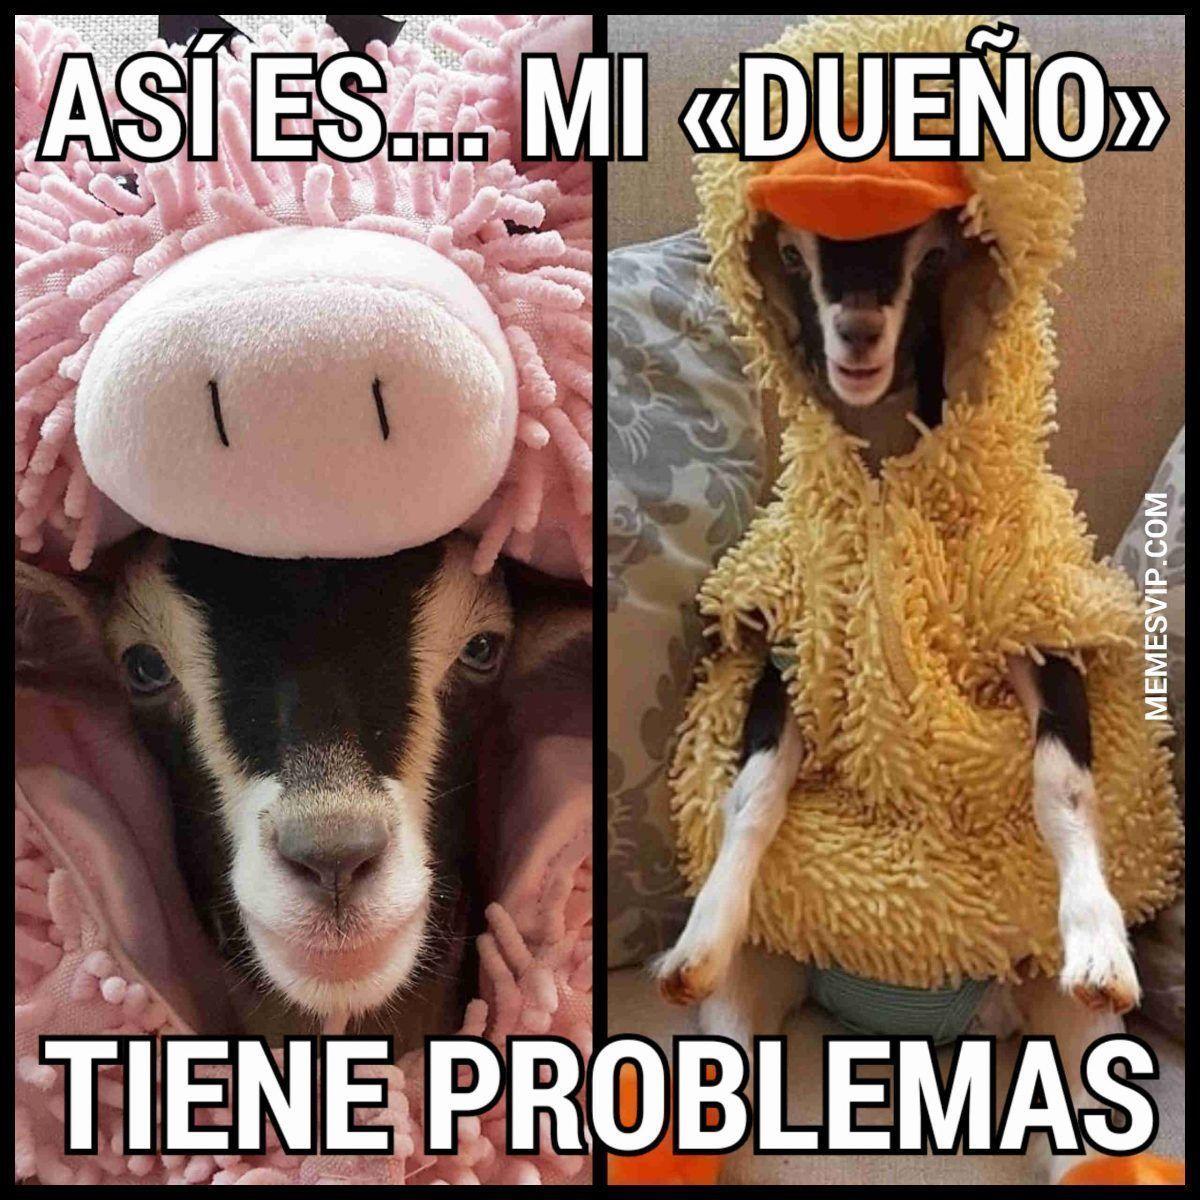 Spanish memes cabra disfrazada pato #2018 #2019 #detodo #chistes #meme #memes #momos #español #memesenespañol #memesvip #chistecorto #humor #funny #risa #lol #chistesmalos #comparte #funnypictures #divertido #gracioso #animales #disfraces #spanishmemes #spanishhumor